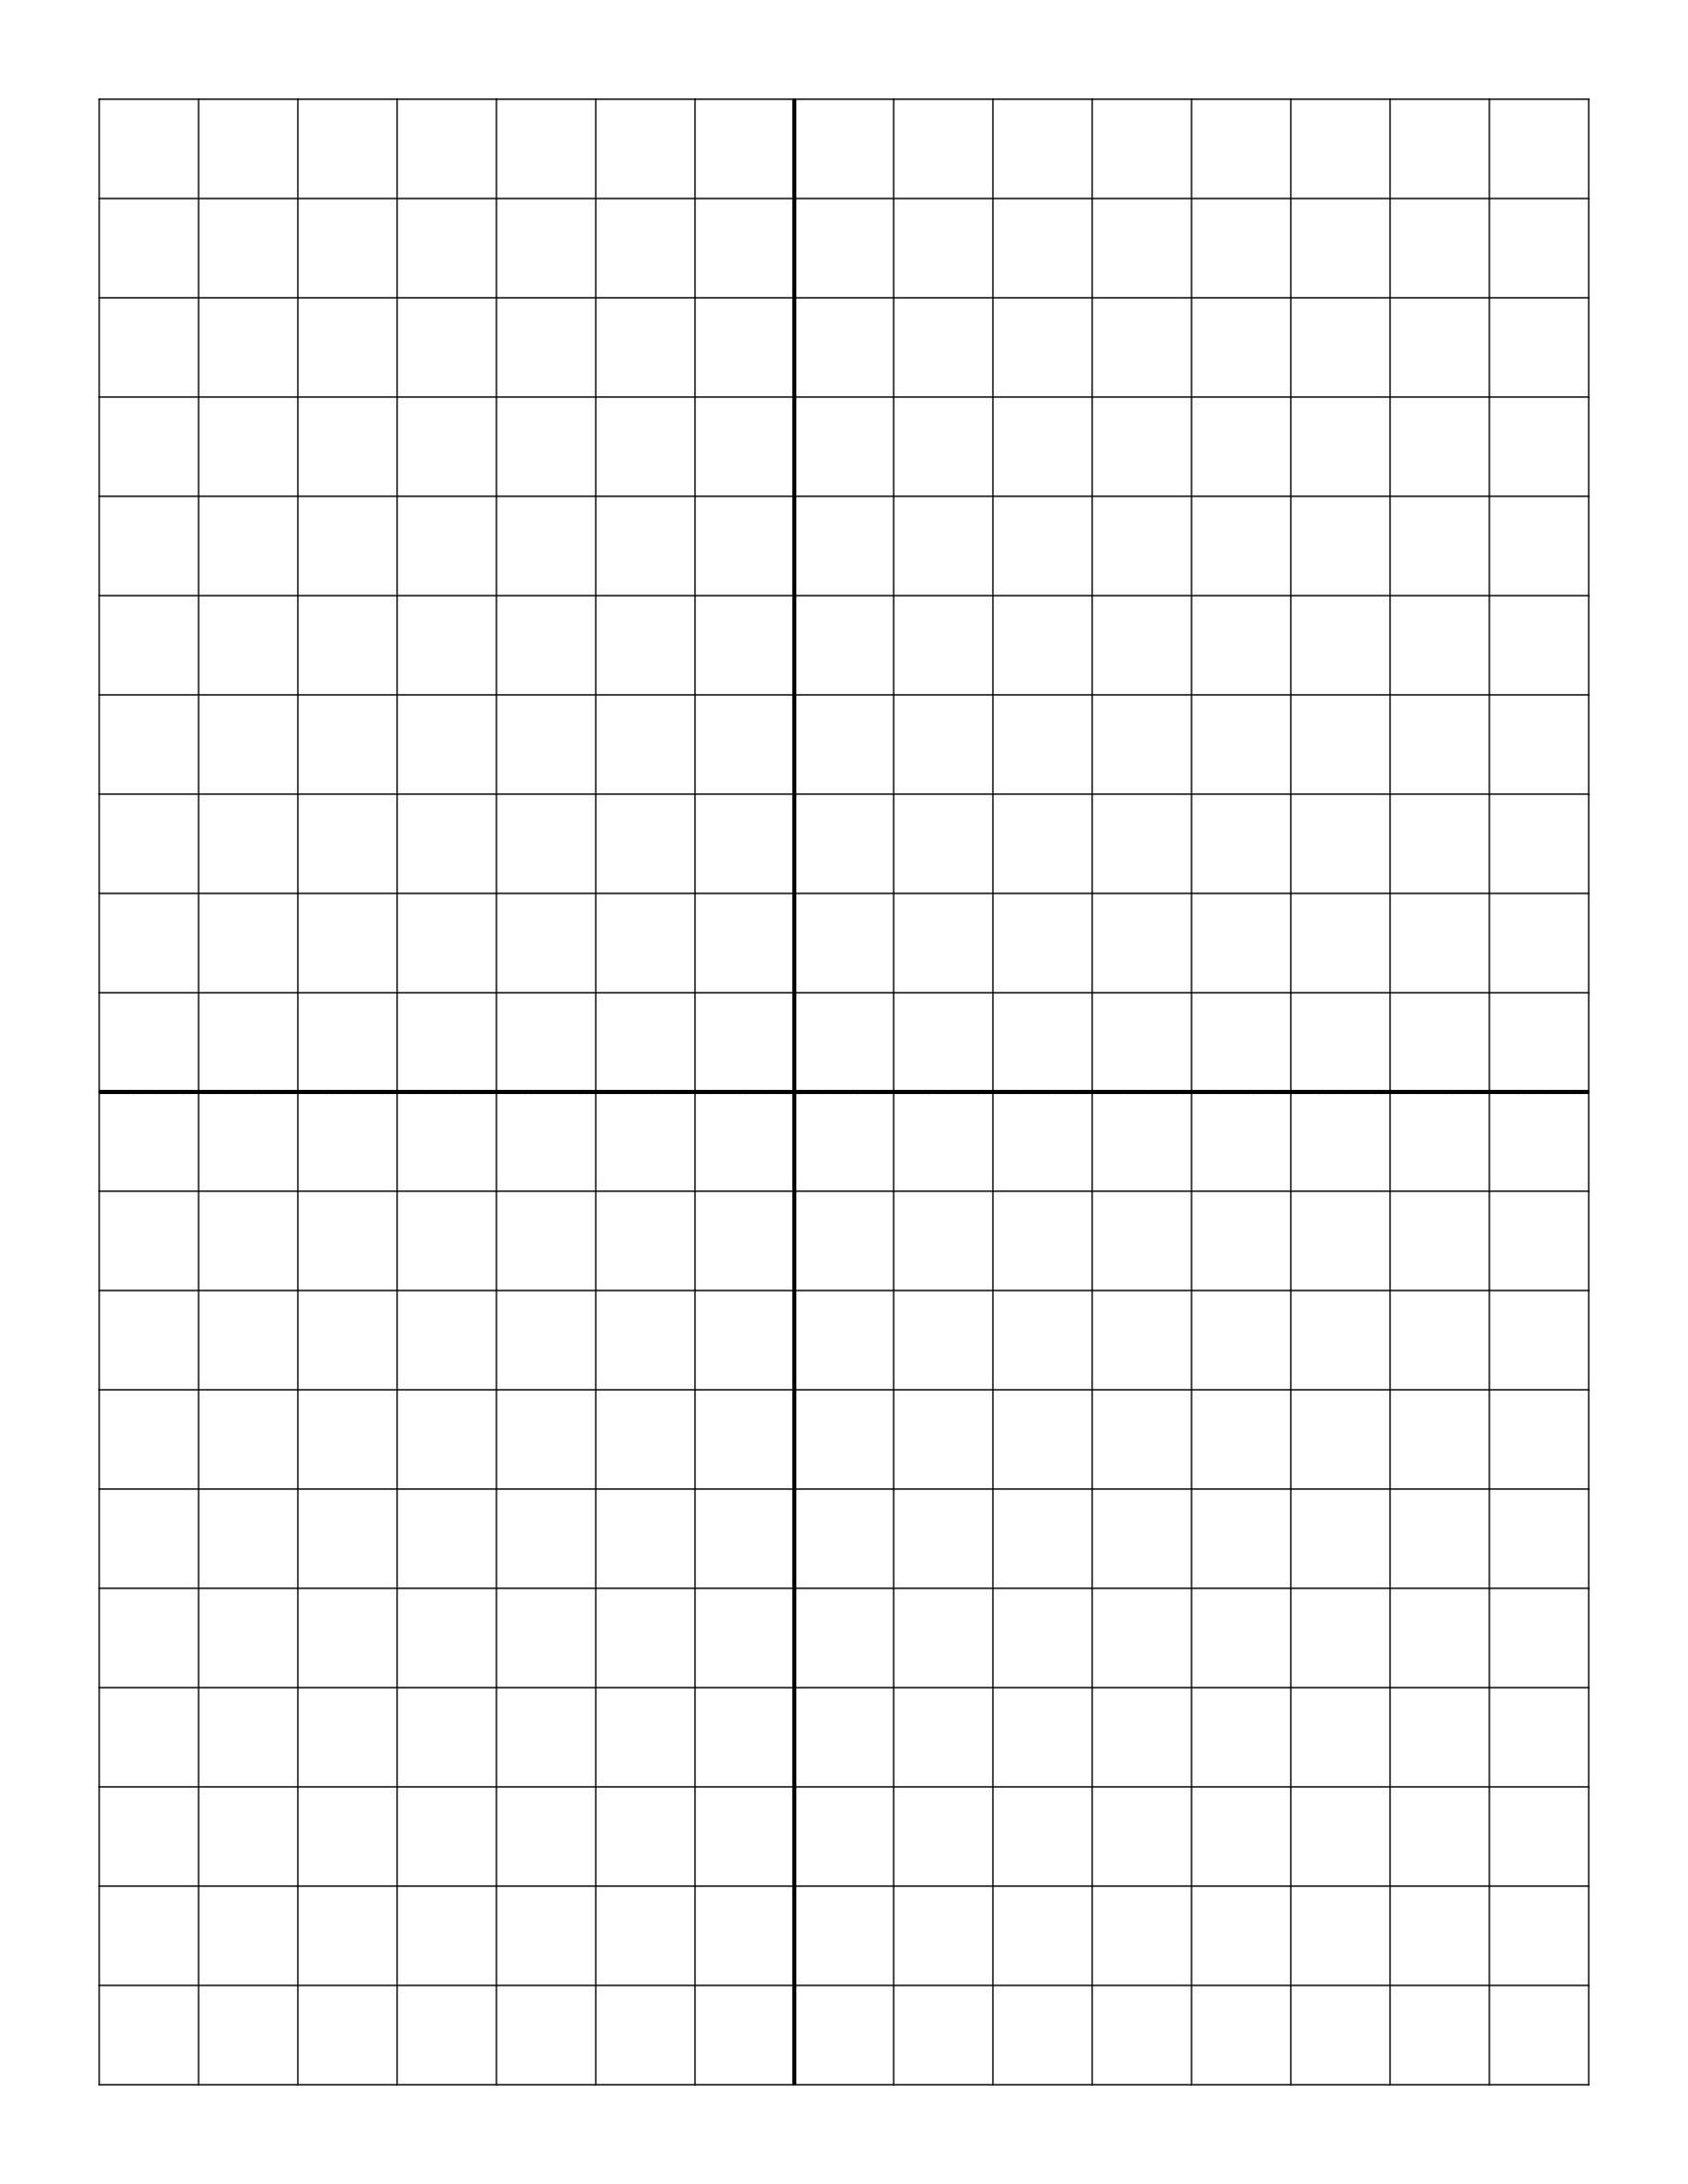 Free Online Graph Paper / Plain - Half Inch Grid Paper Free Printable